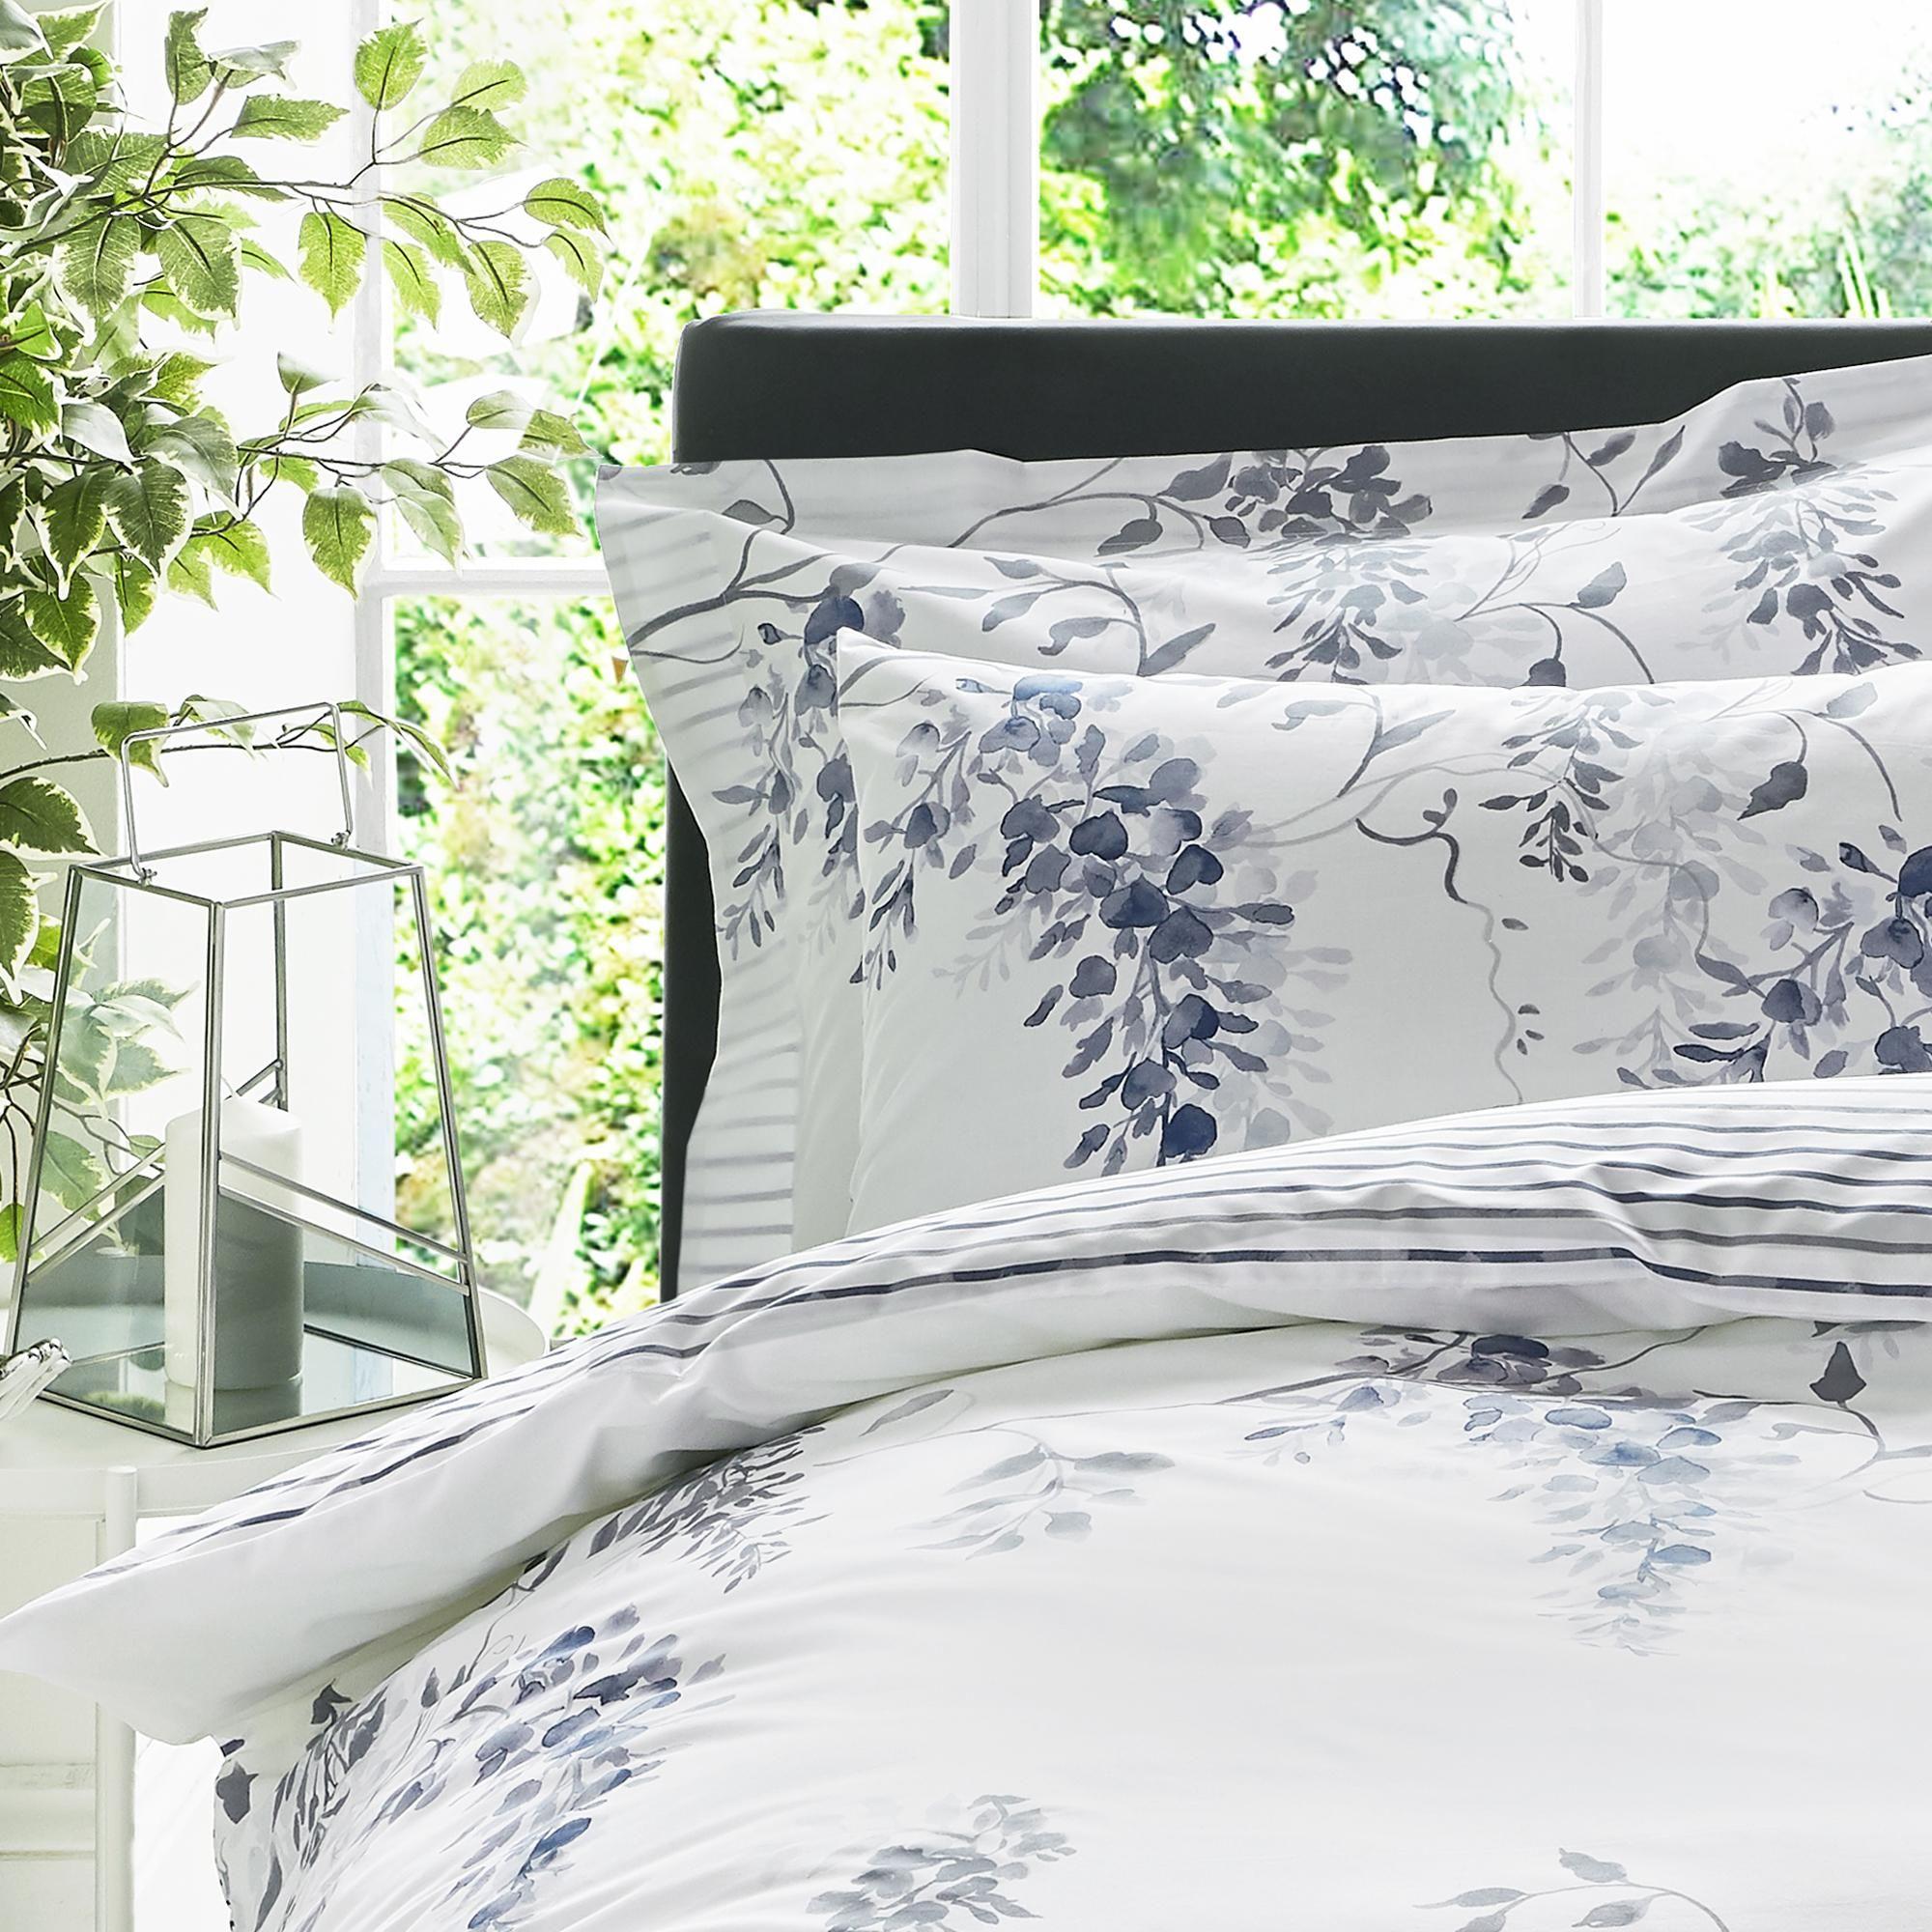 Emma Willis Grace Oxford Pillowcase in